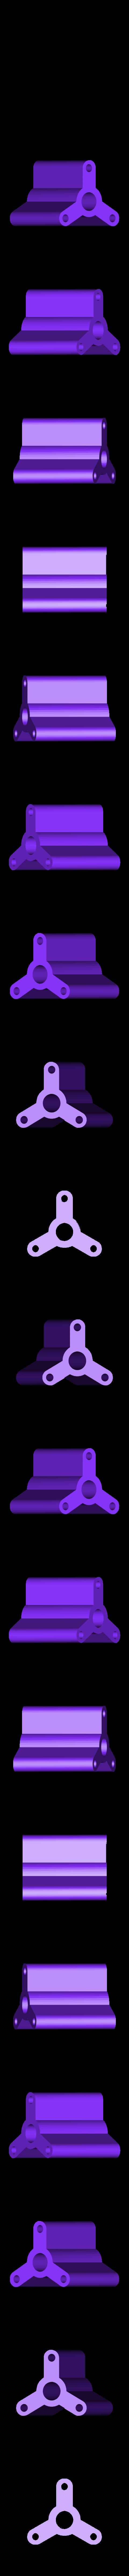 D74.5mm x 75mm Spool adapter A.STL Download STL file Spool Holder Hub Adapters • Template to 3D print, PlanetBlue